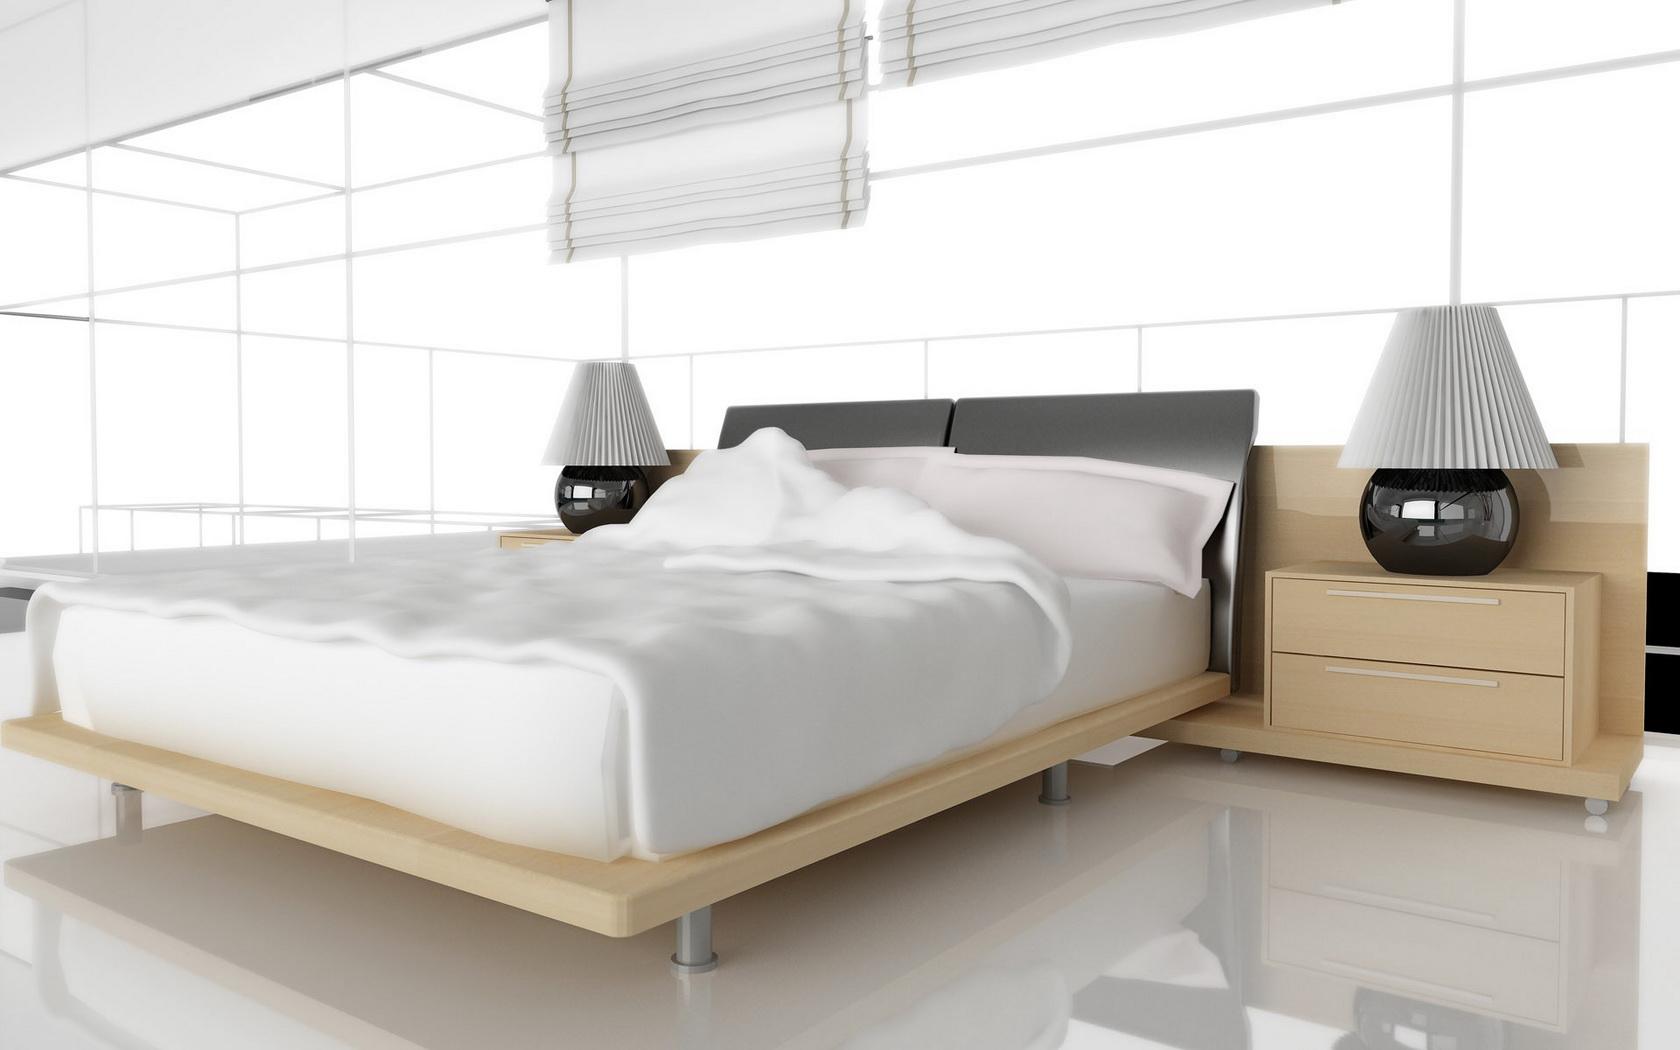 Bedroom Bed Architecture Interior Design wallpaper   1680x1050   148350    WallpaperUP. Bedroom Bed Architecture Interior Design wallpaper   1680x1050